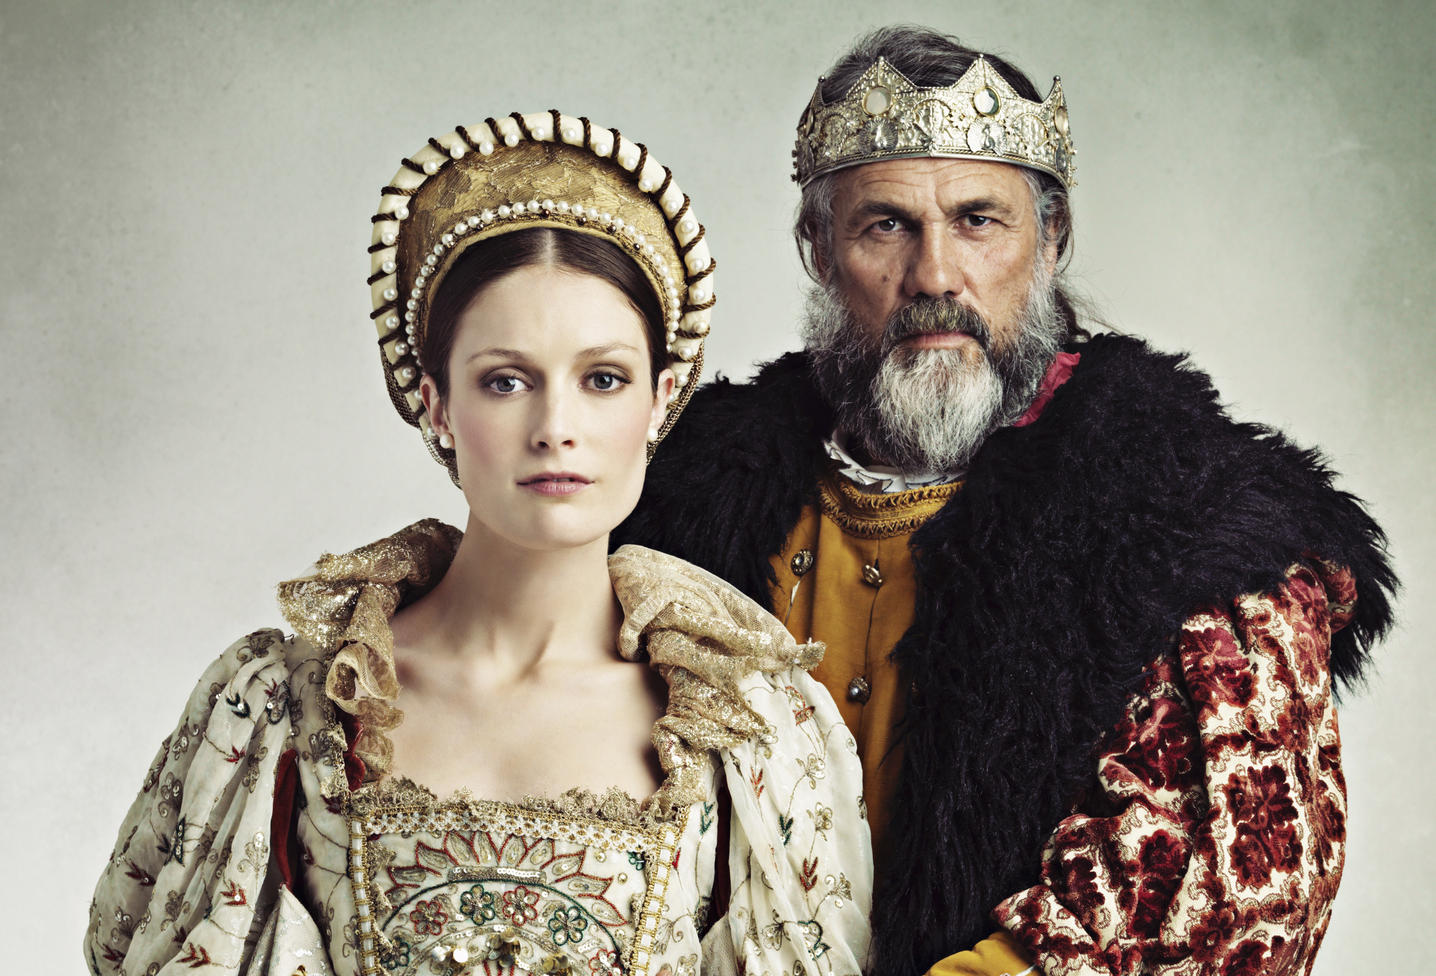 Elizabethan Costumes | LoveToKnow